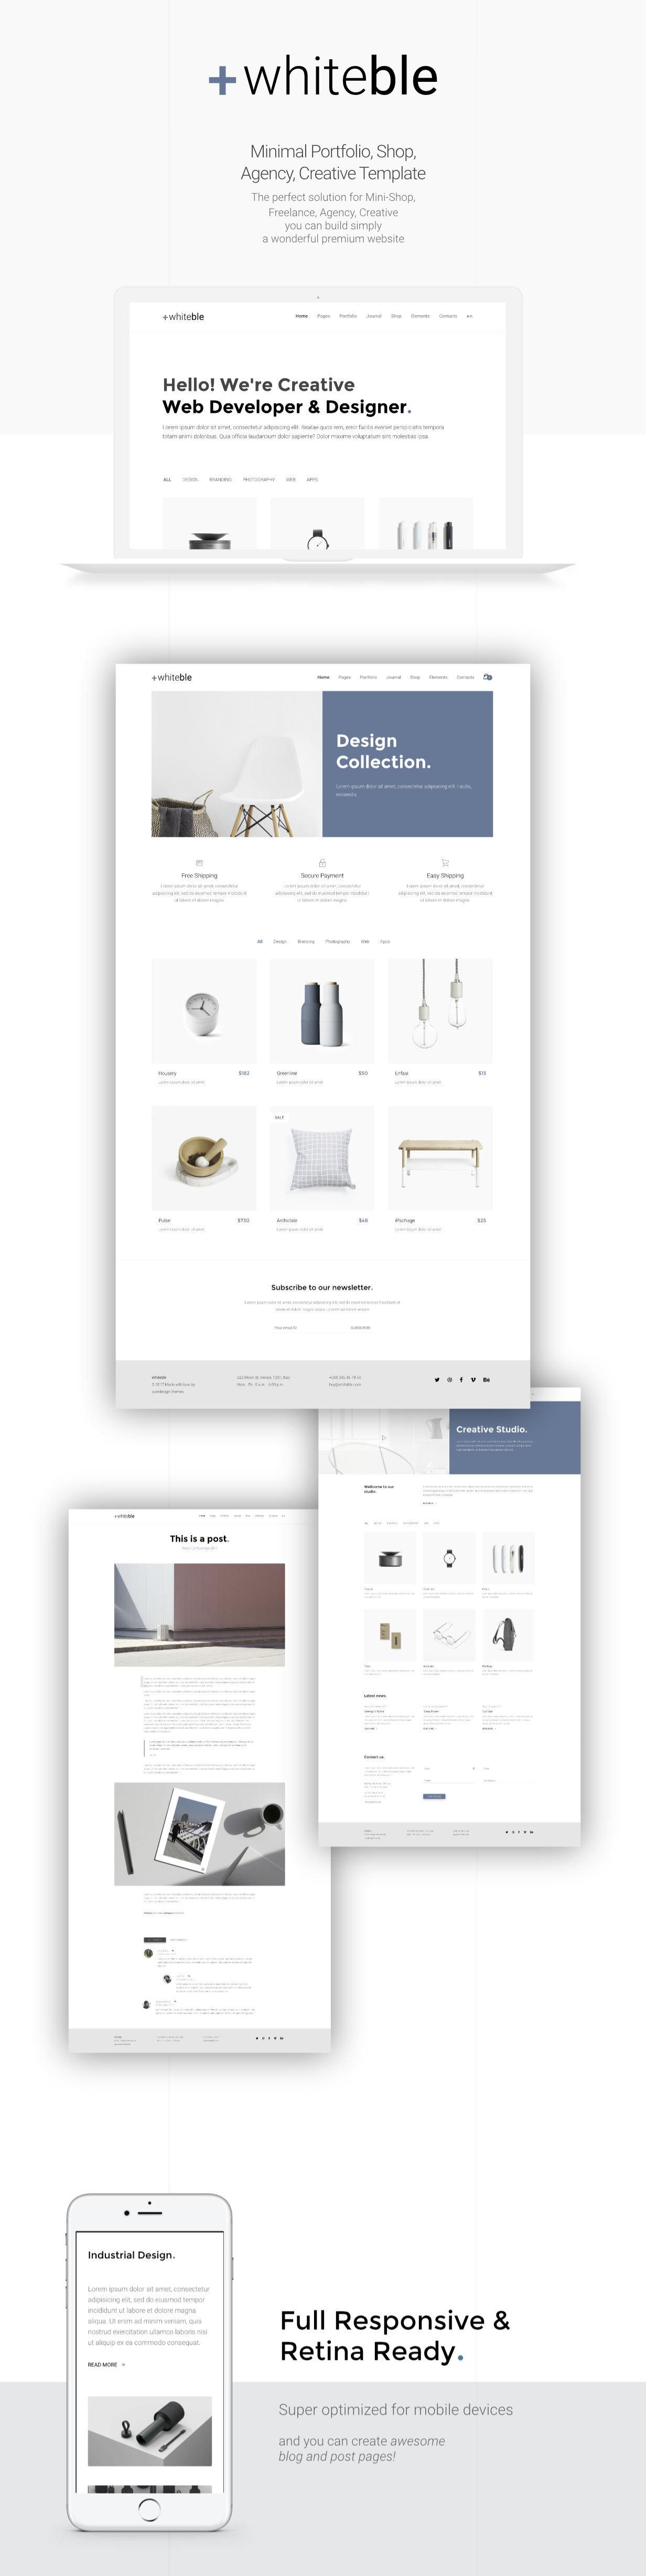 Whiteble - Minimal Portfolio, Agency, Shop, Creative HTML Template - 1